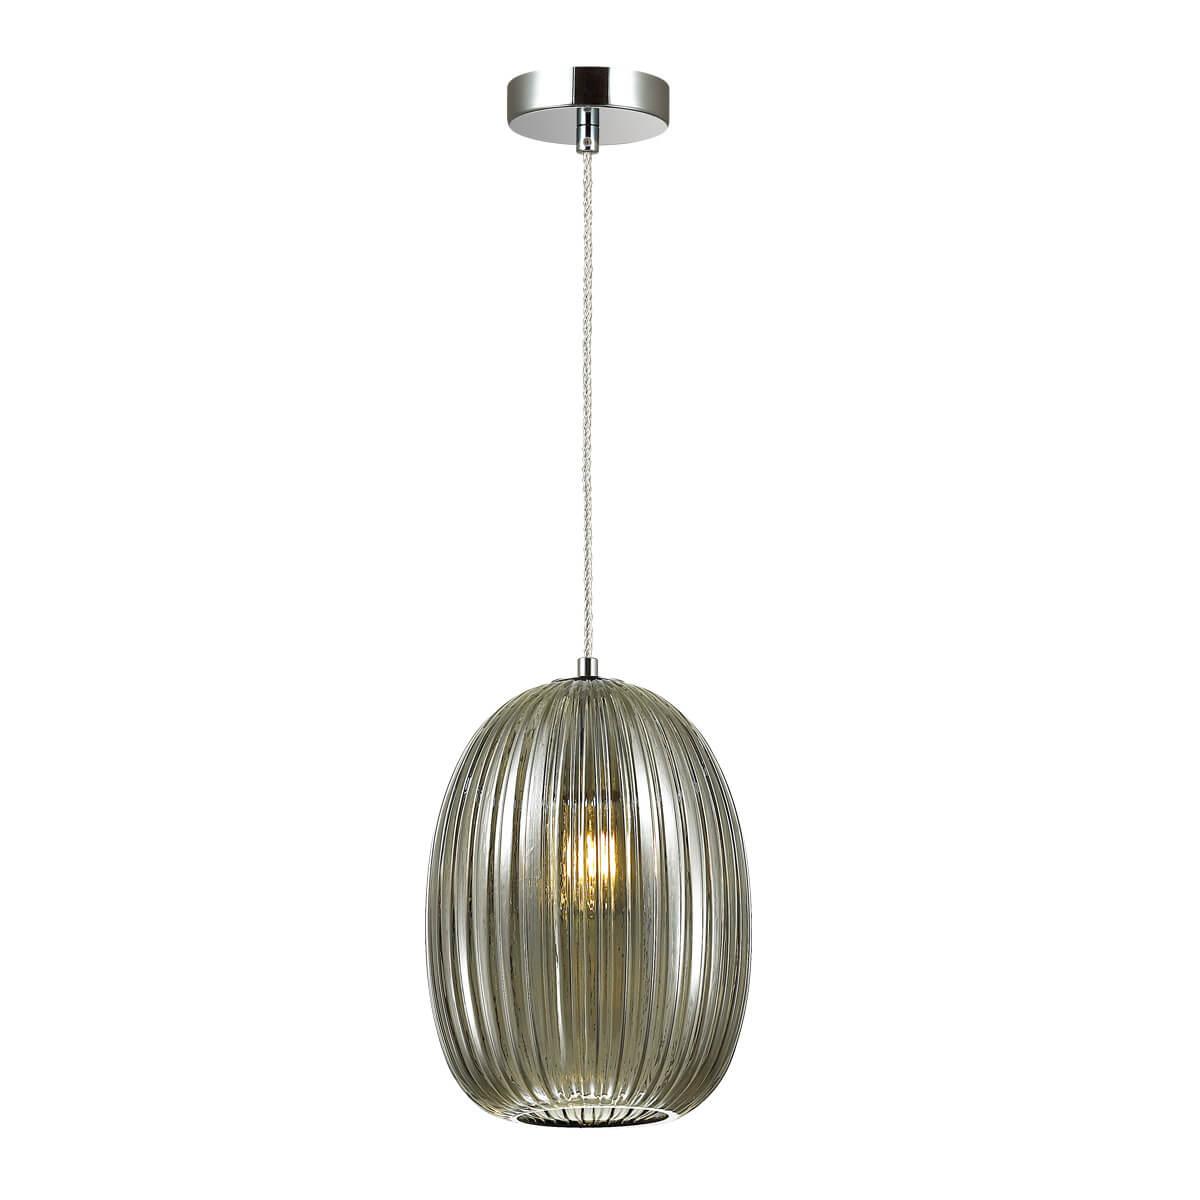 Светильник Odeon Light 4702/1 Pendant светильник odeon light 4702 1 dori